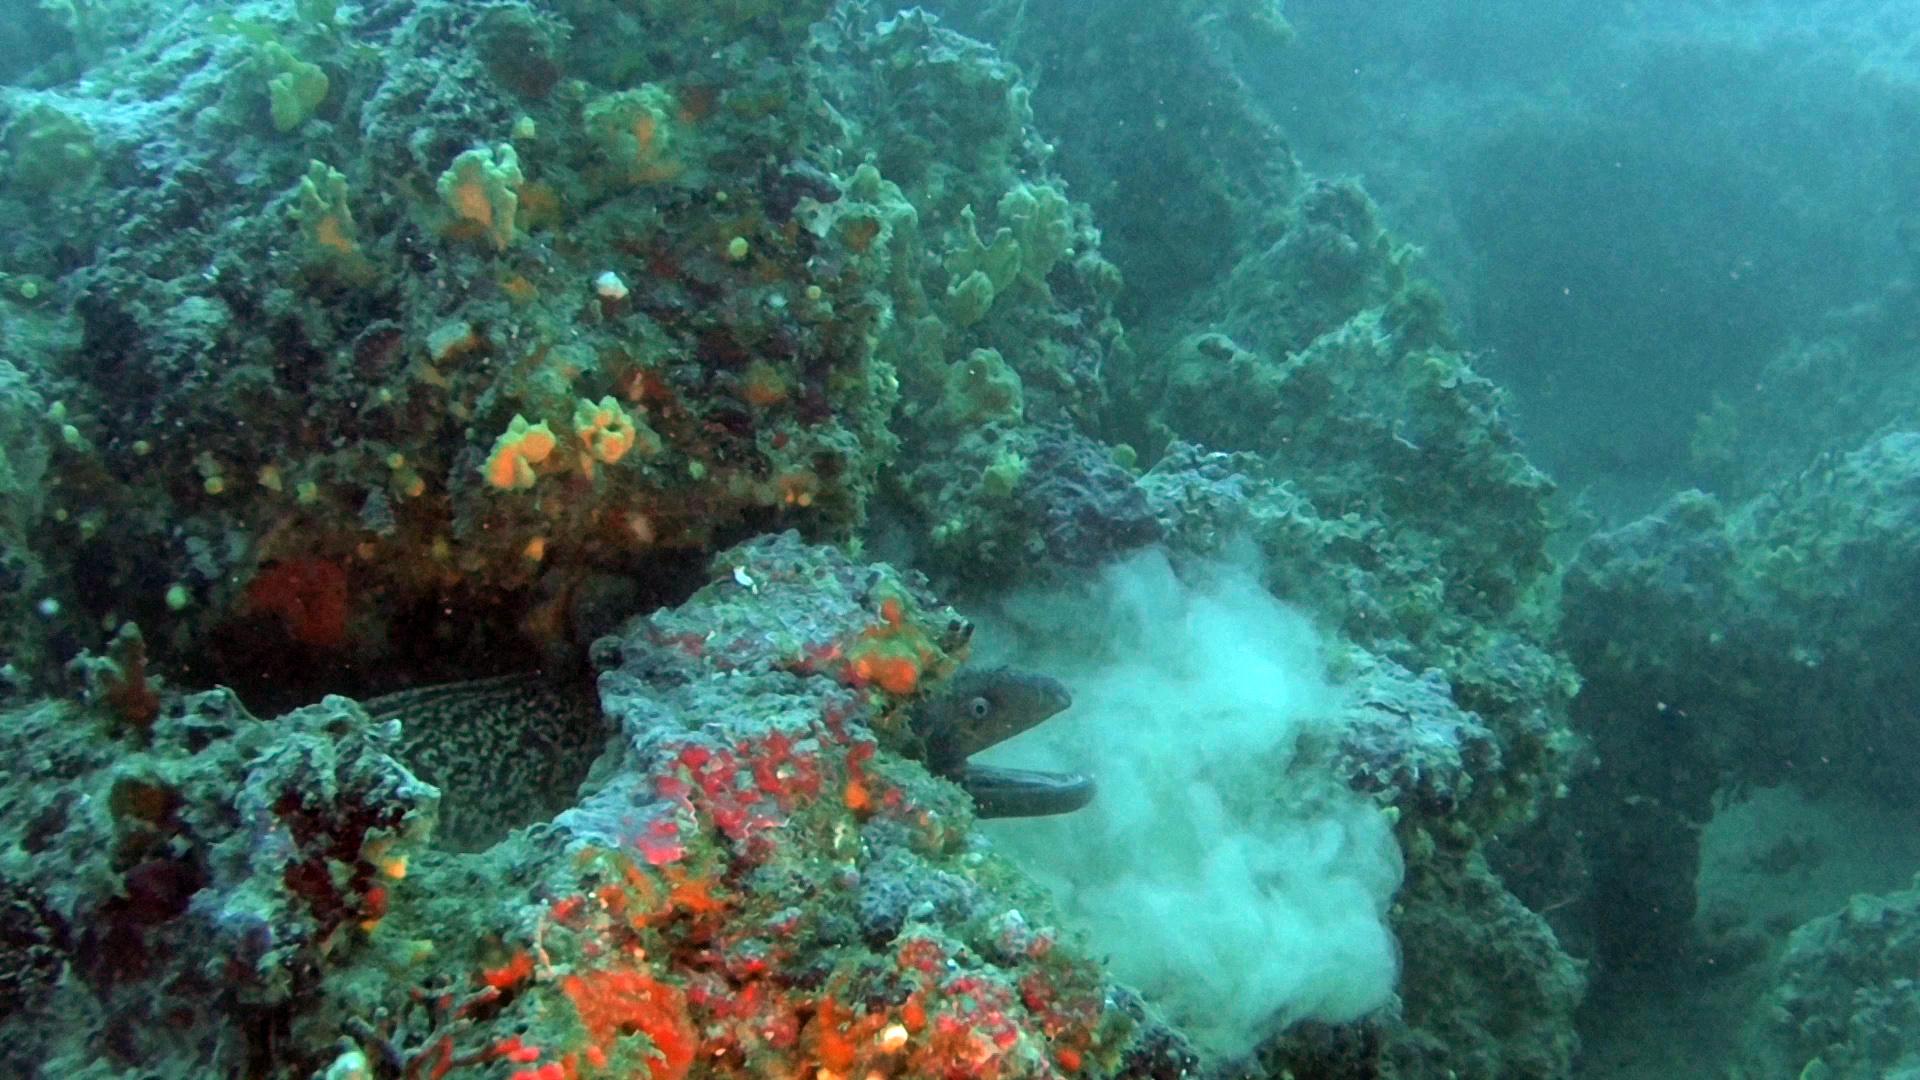 Moray Eel - Muraena helena